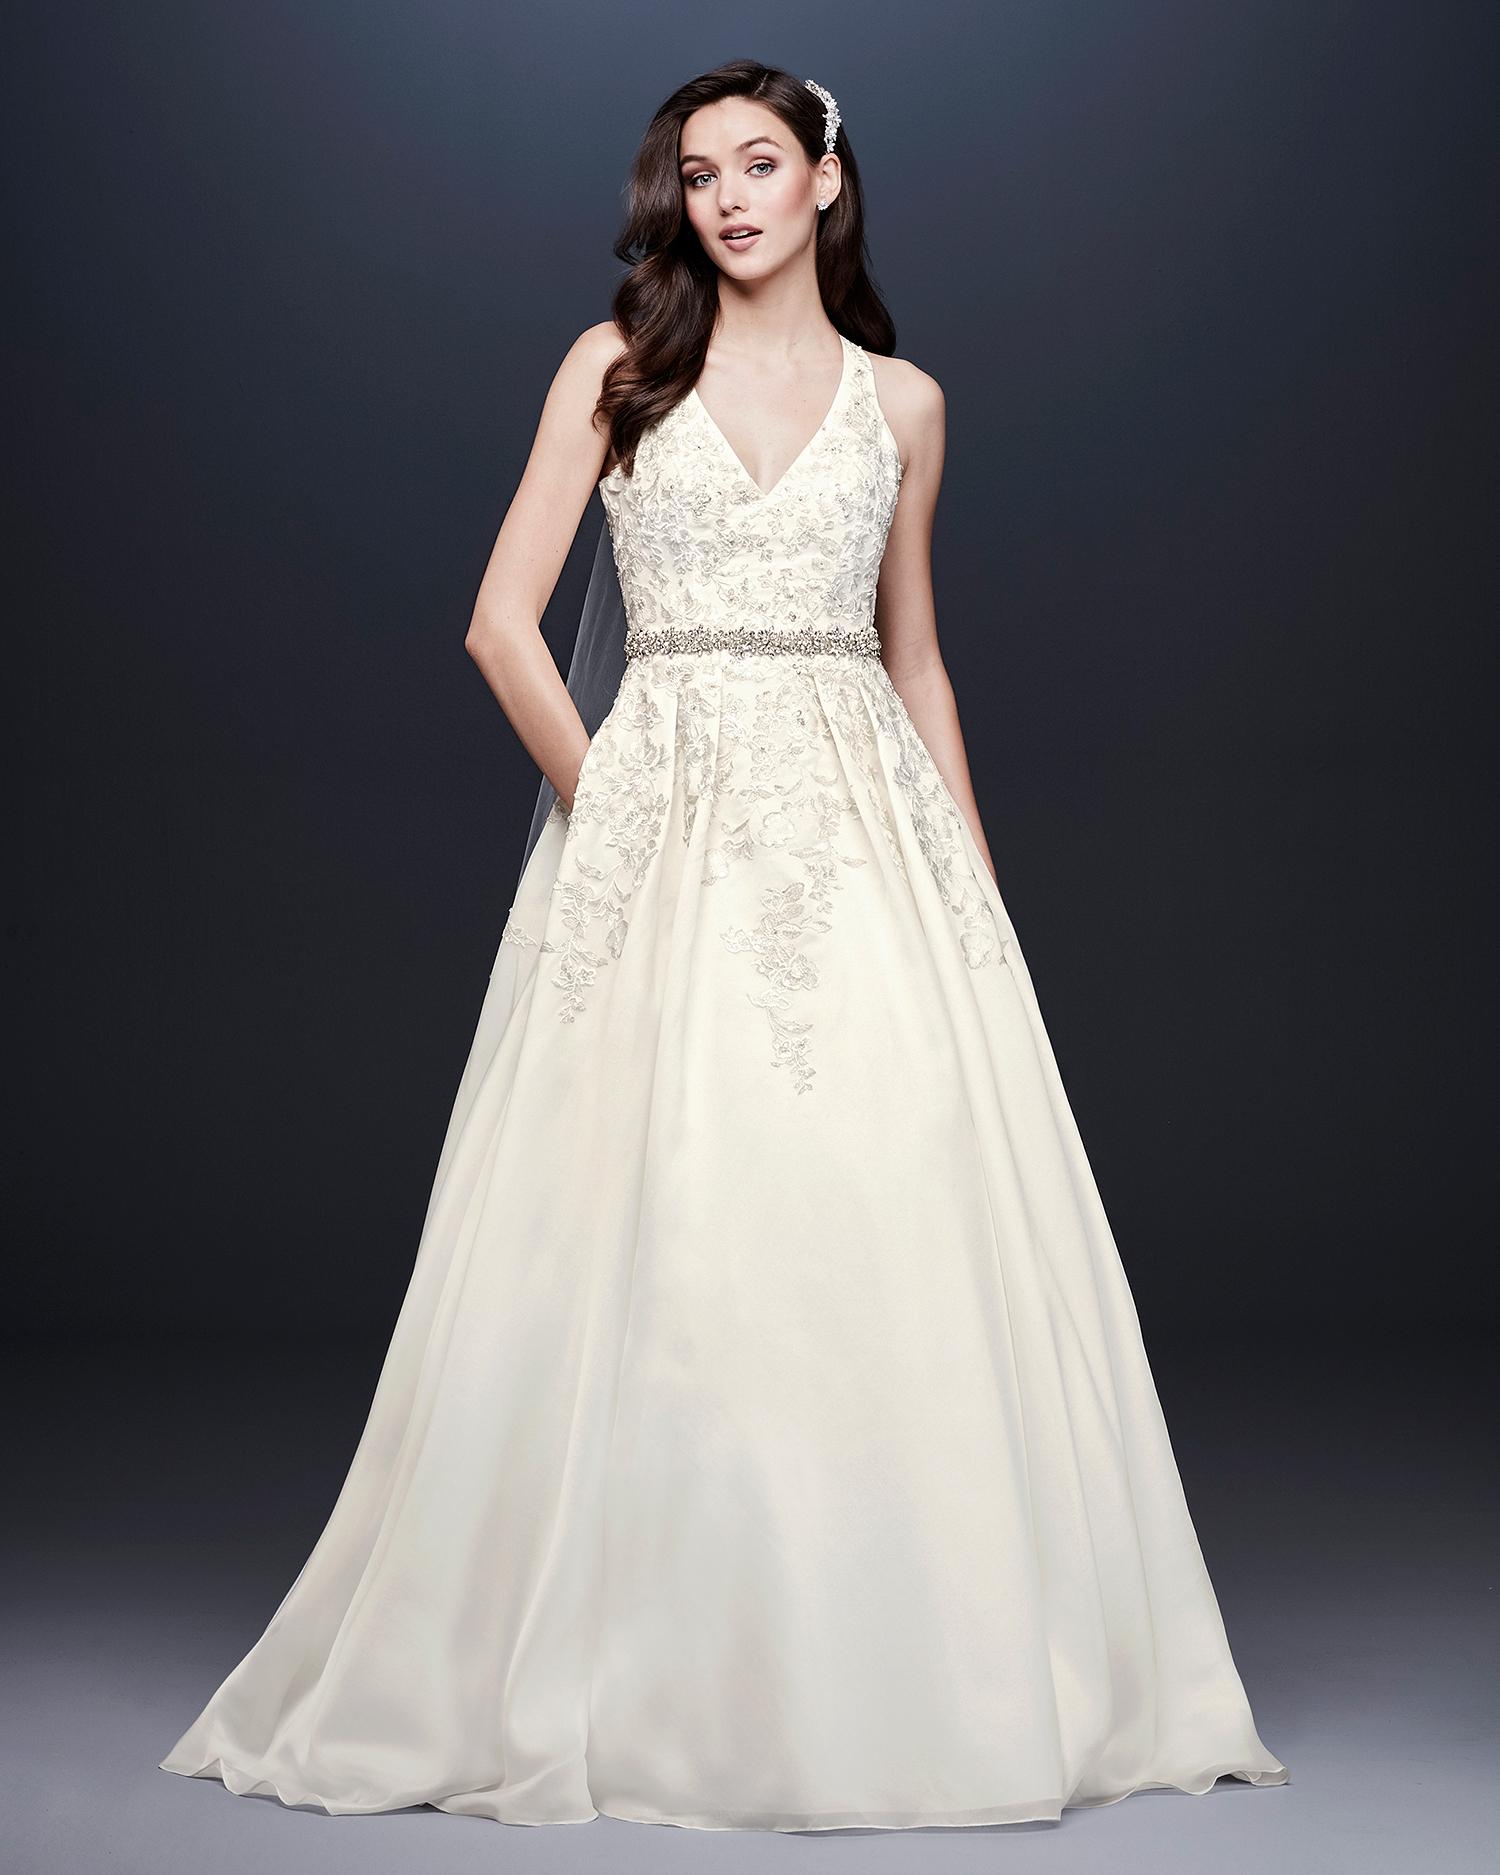 davids bridal wedding dress fall 2019 v-neck a-line with crystal belt